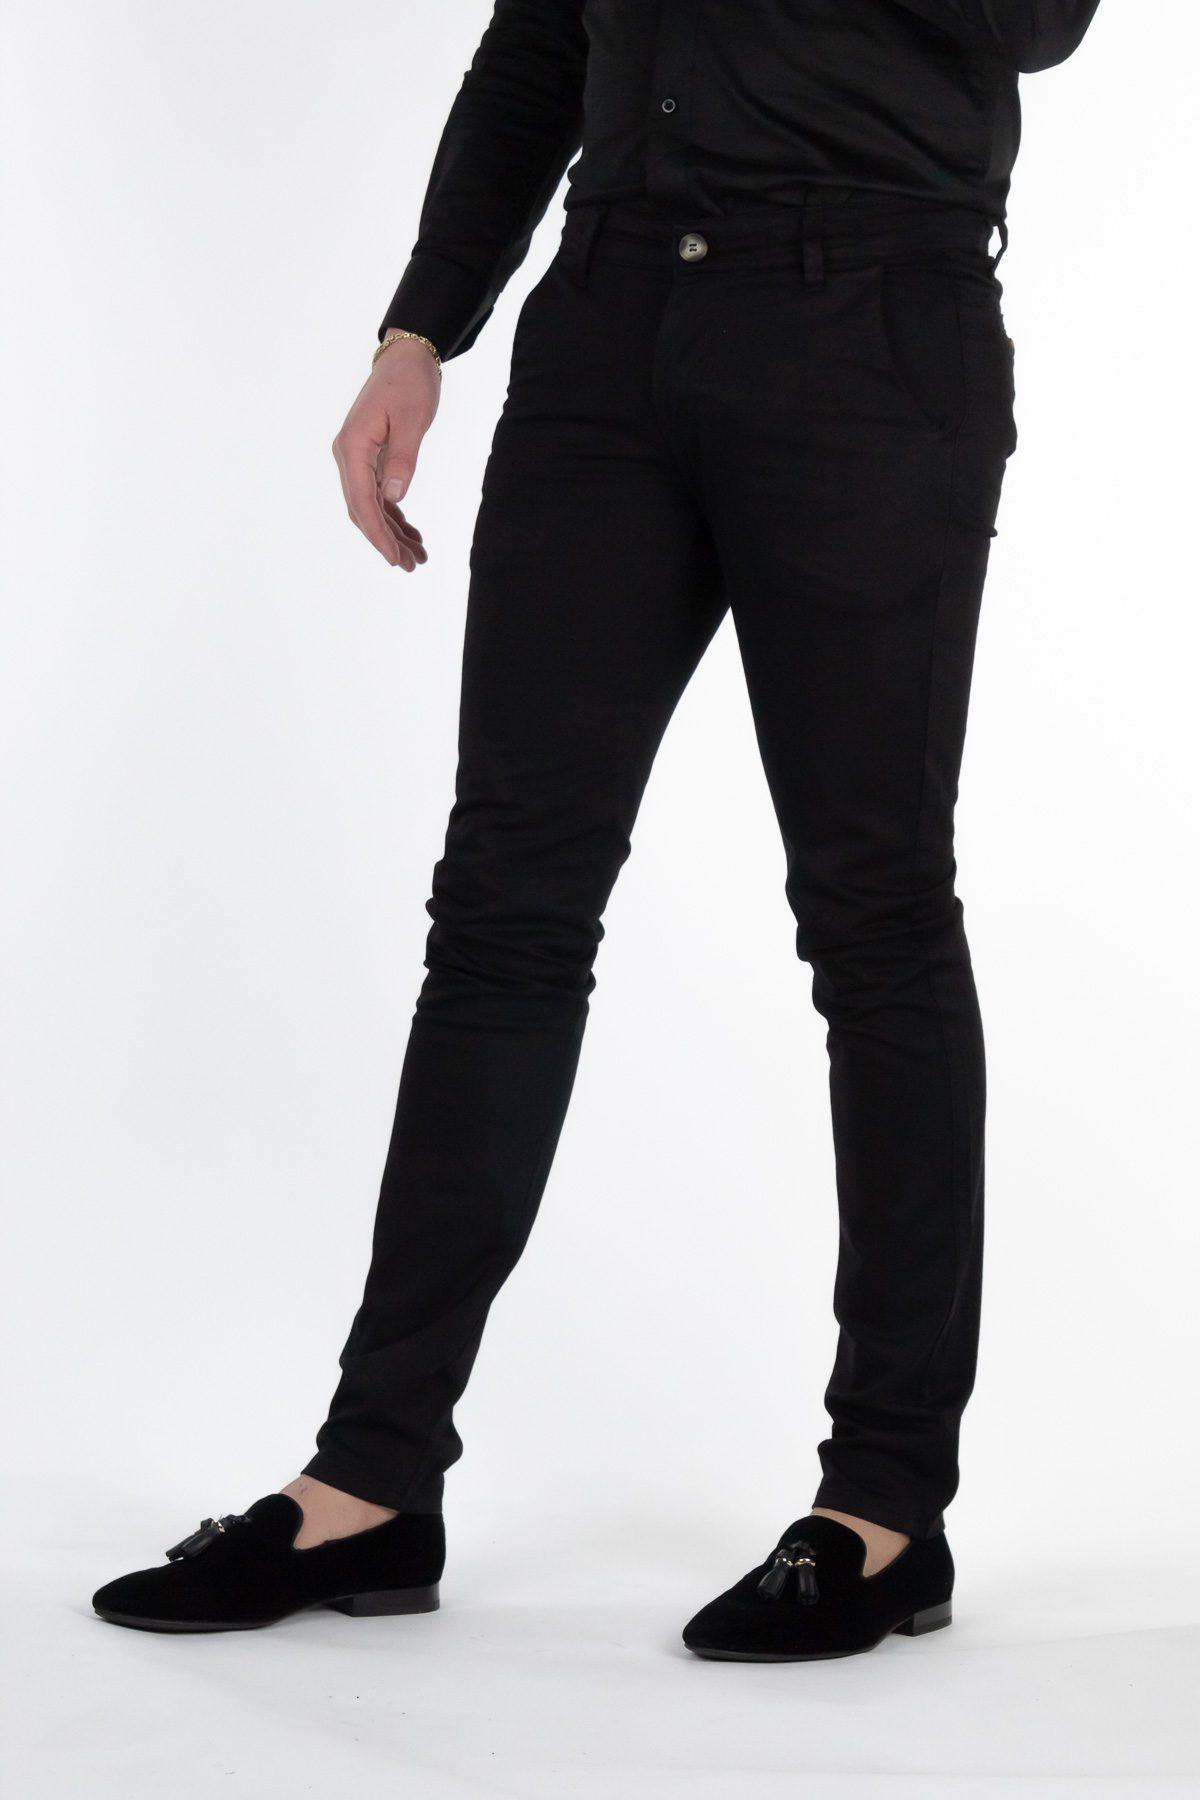 Richesse Marbella Black Pantalon 2236-2